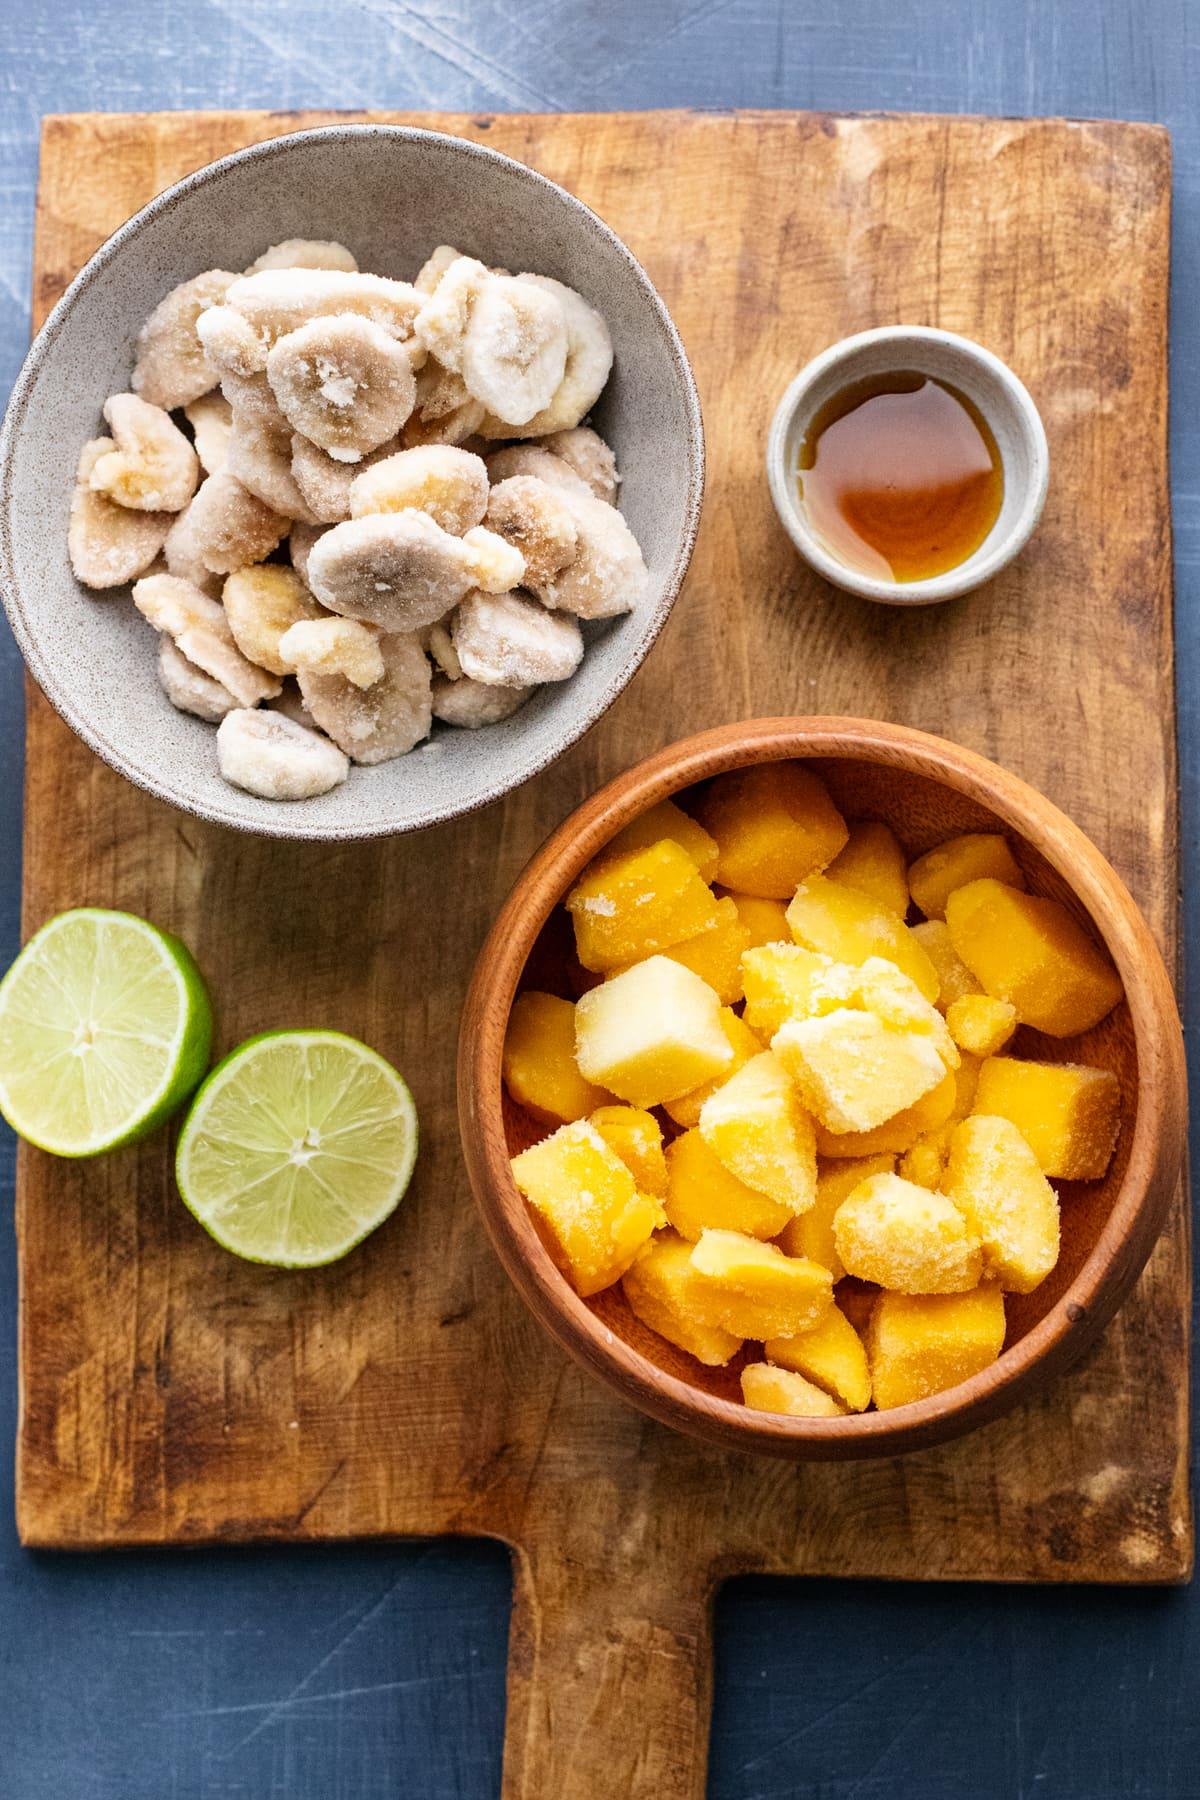 mango lime sorbet ingredients arranged on brown wooden cutting board.